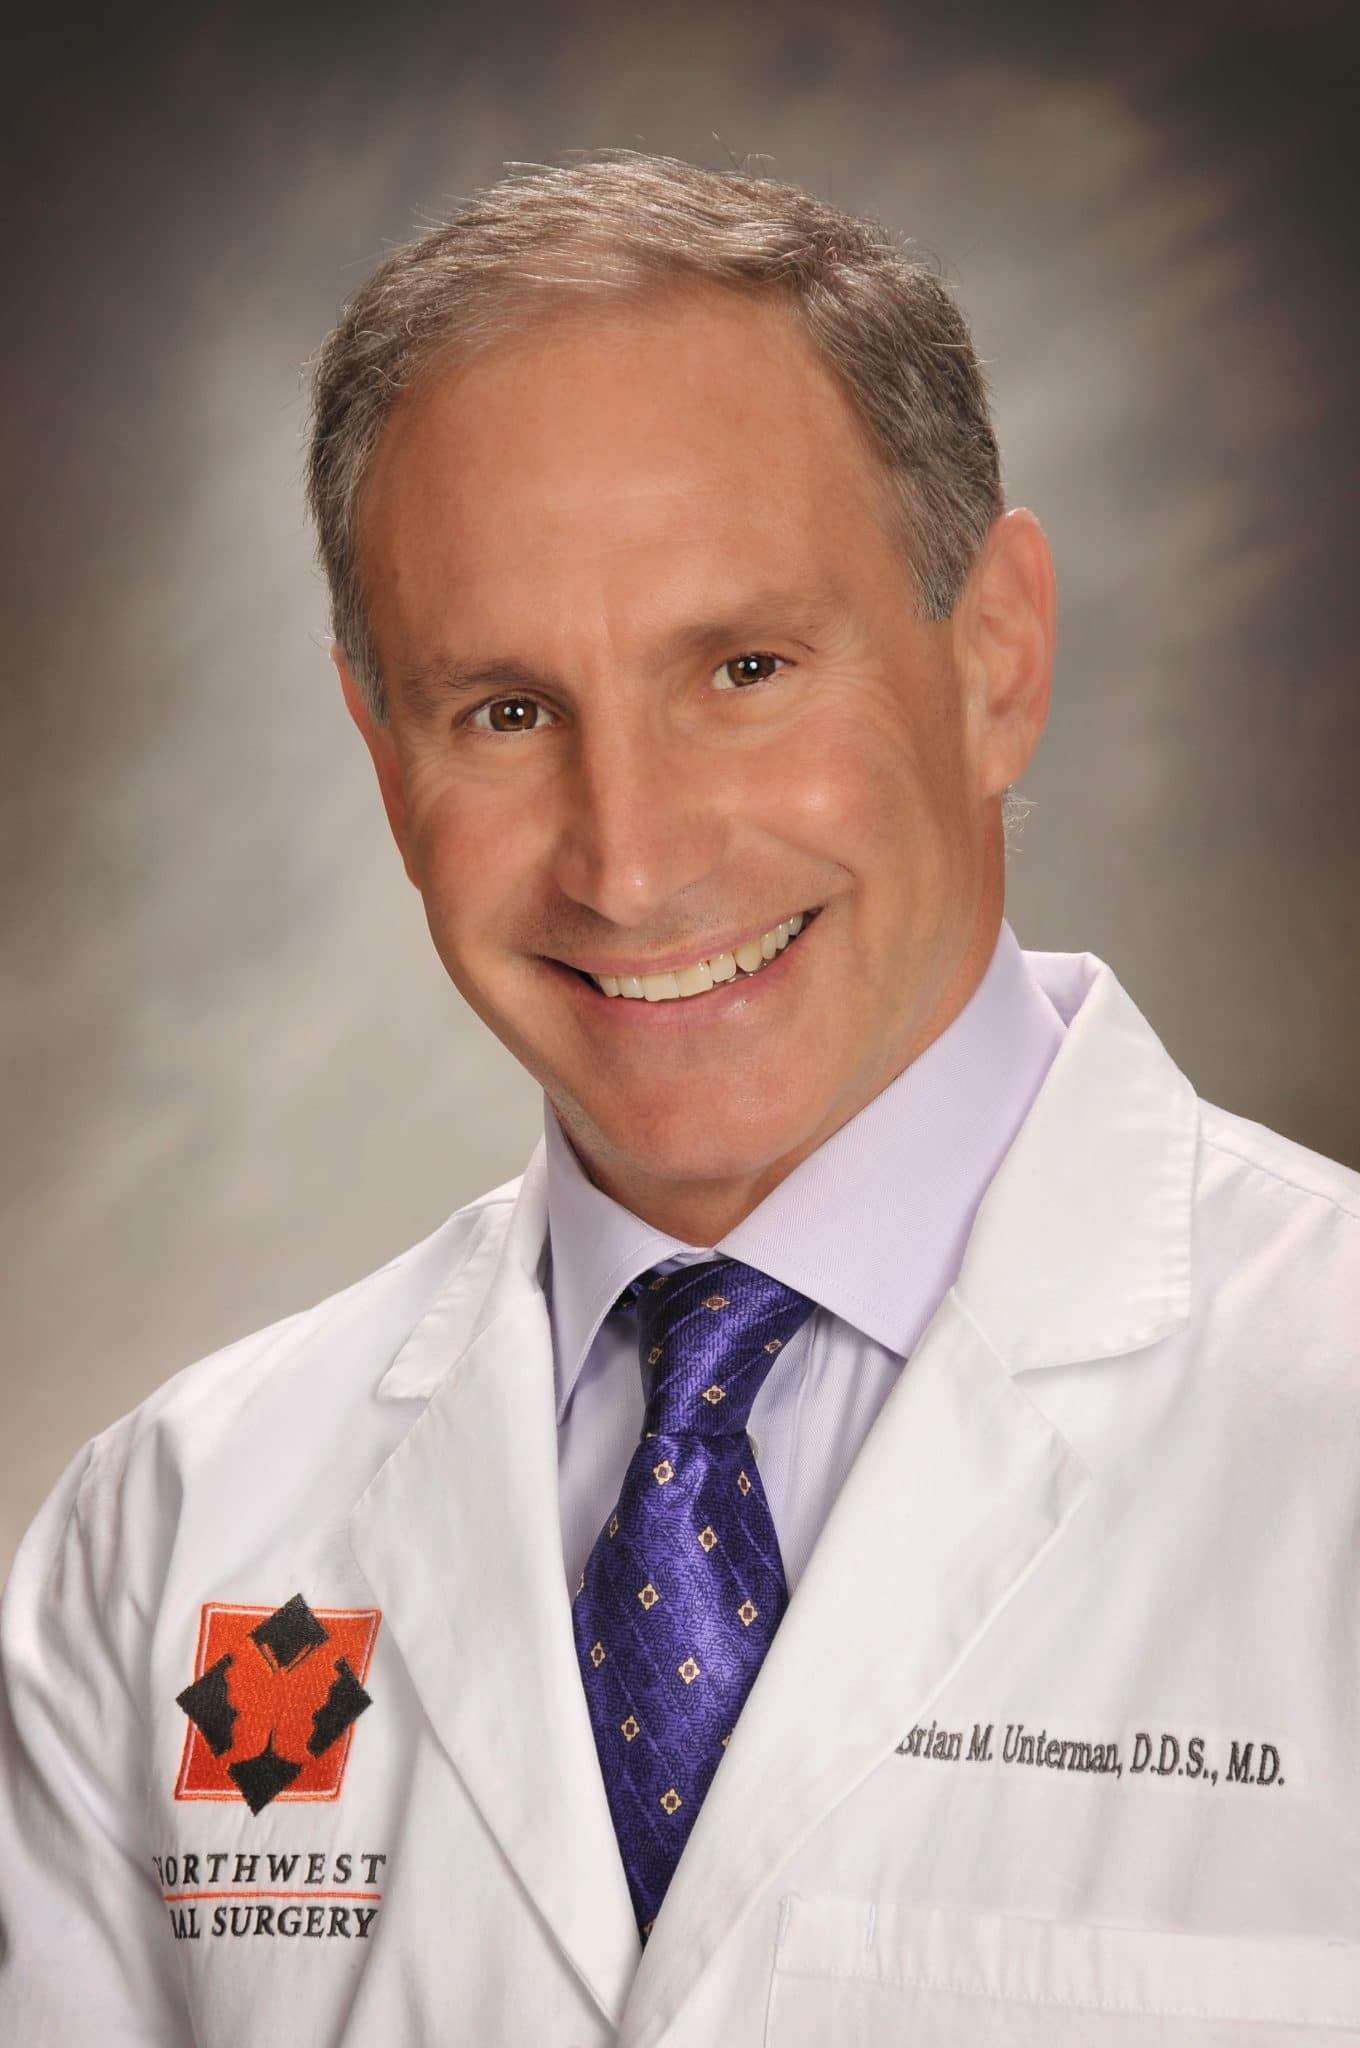 Dr Brian Unterm - Northwest Oral & Maxillofacial Surgery